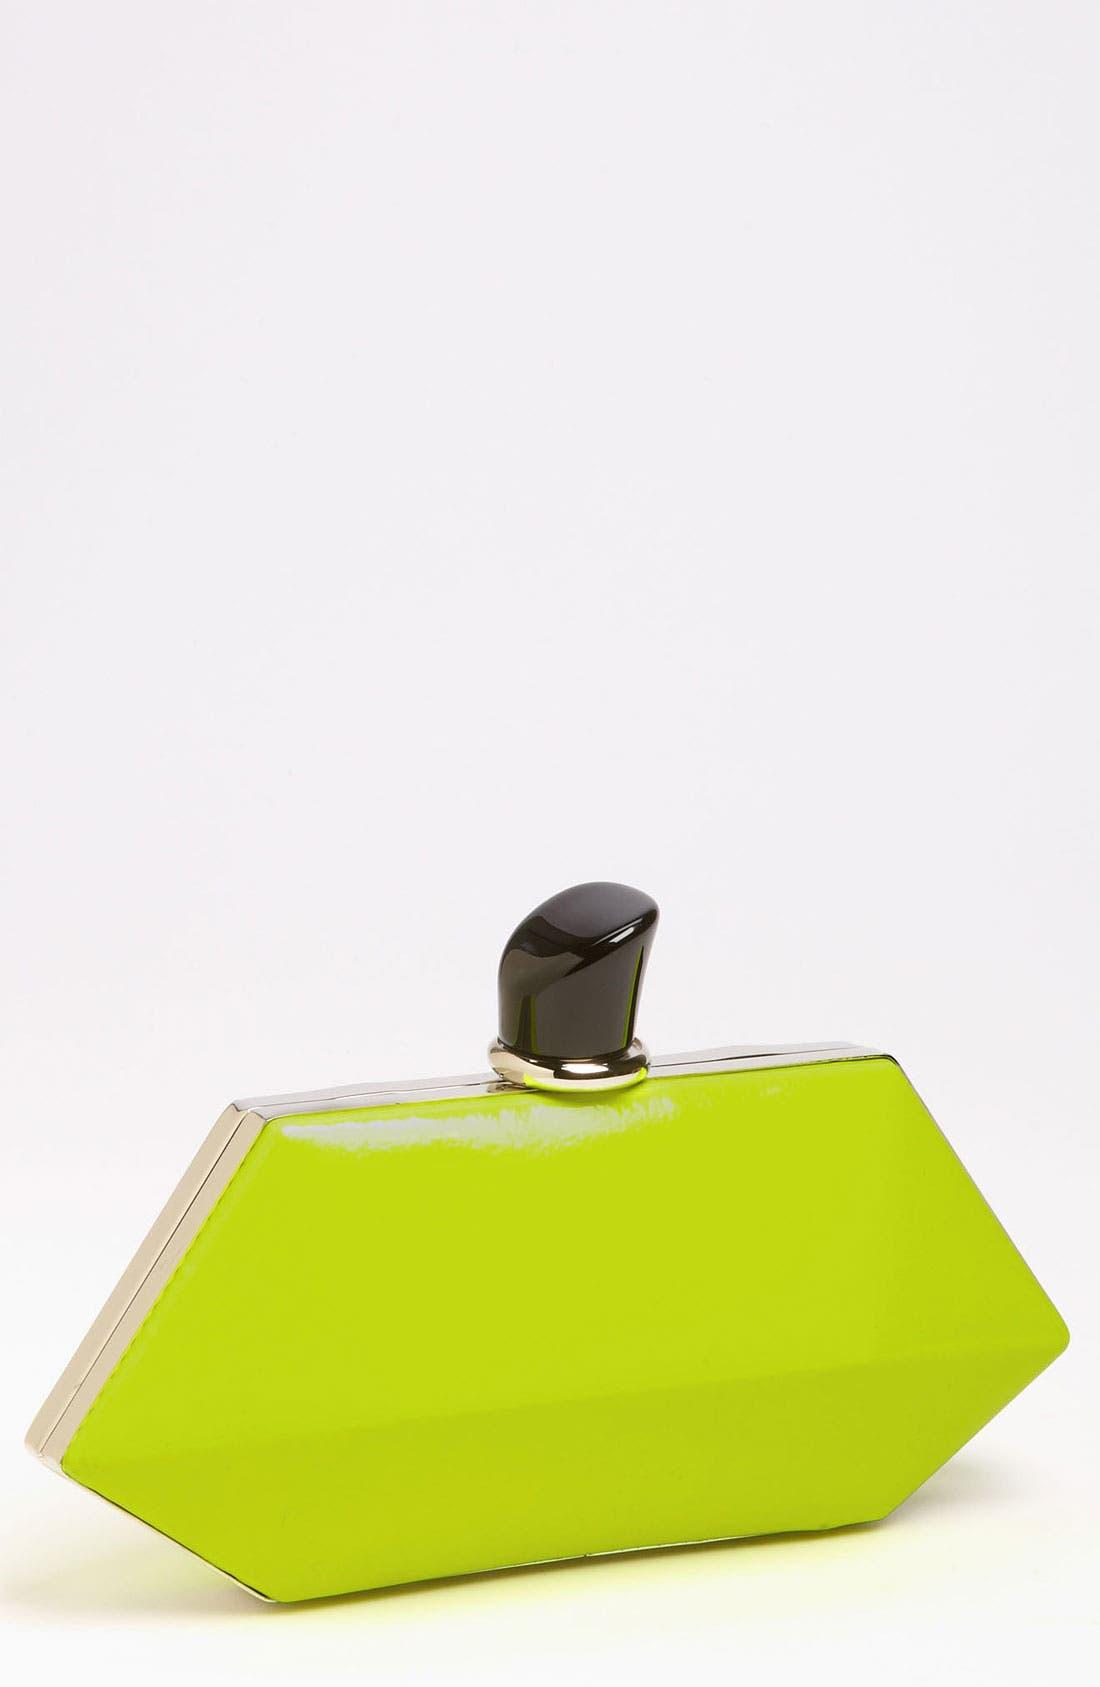 Alternate Image 1 Selected - High Fashion Handbags Clutch